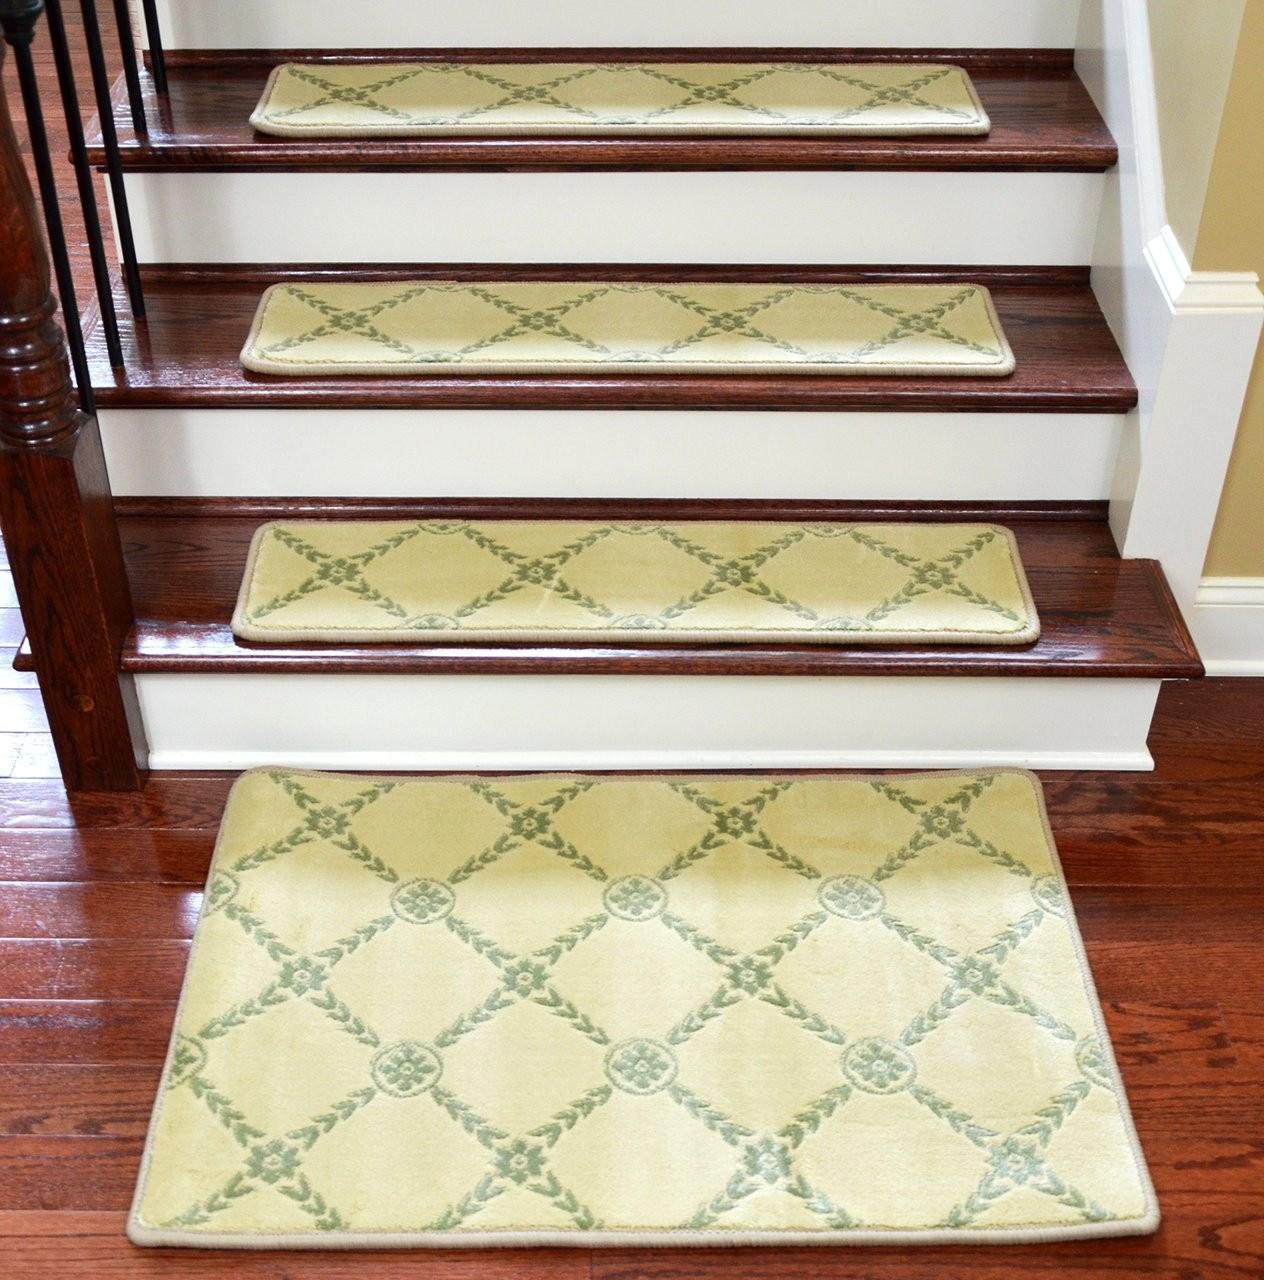 Dean Premium Non Skid Carpet Stair Treads Runner Rugs Duchess   Stair Treads And Runners   Flooring   Hardwood   Staircase   Bullnose Carpet Runners   Treads Carpet